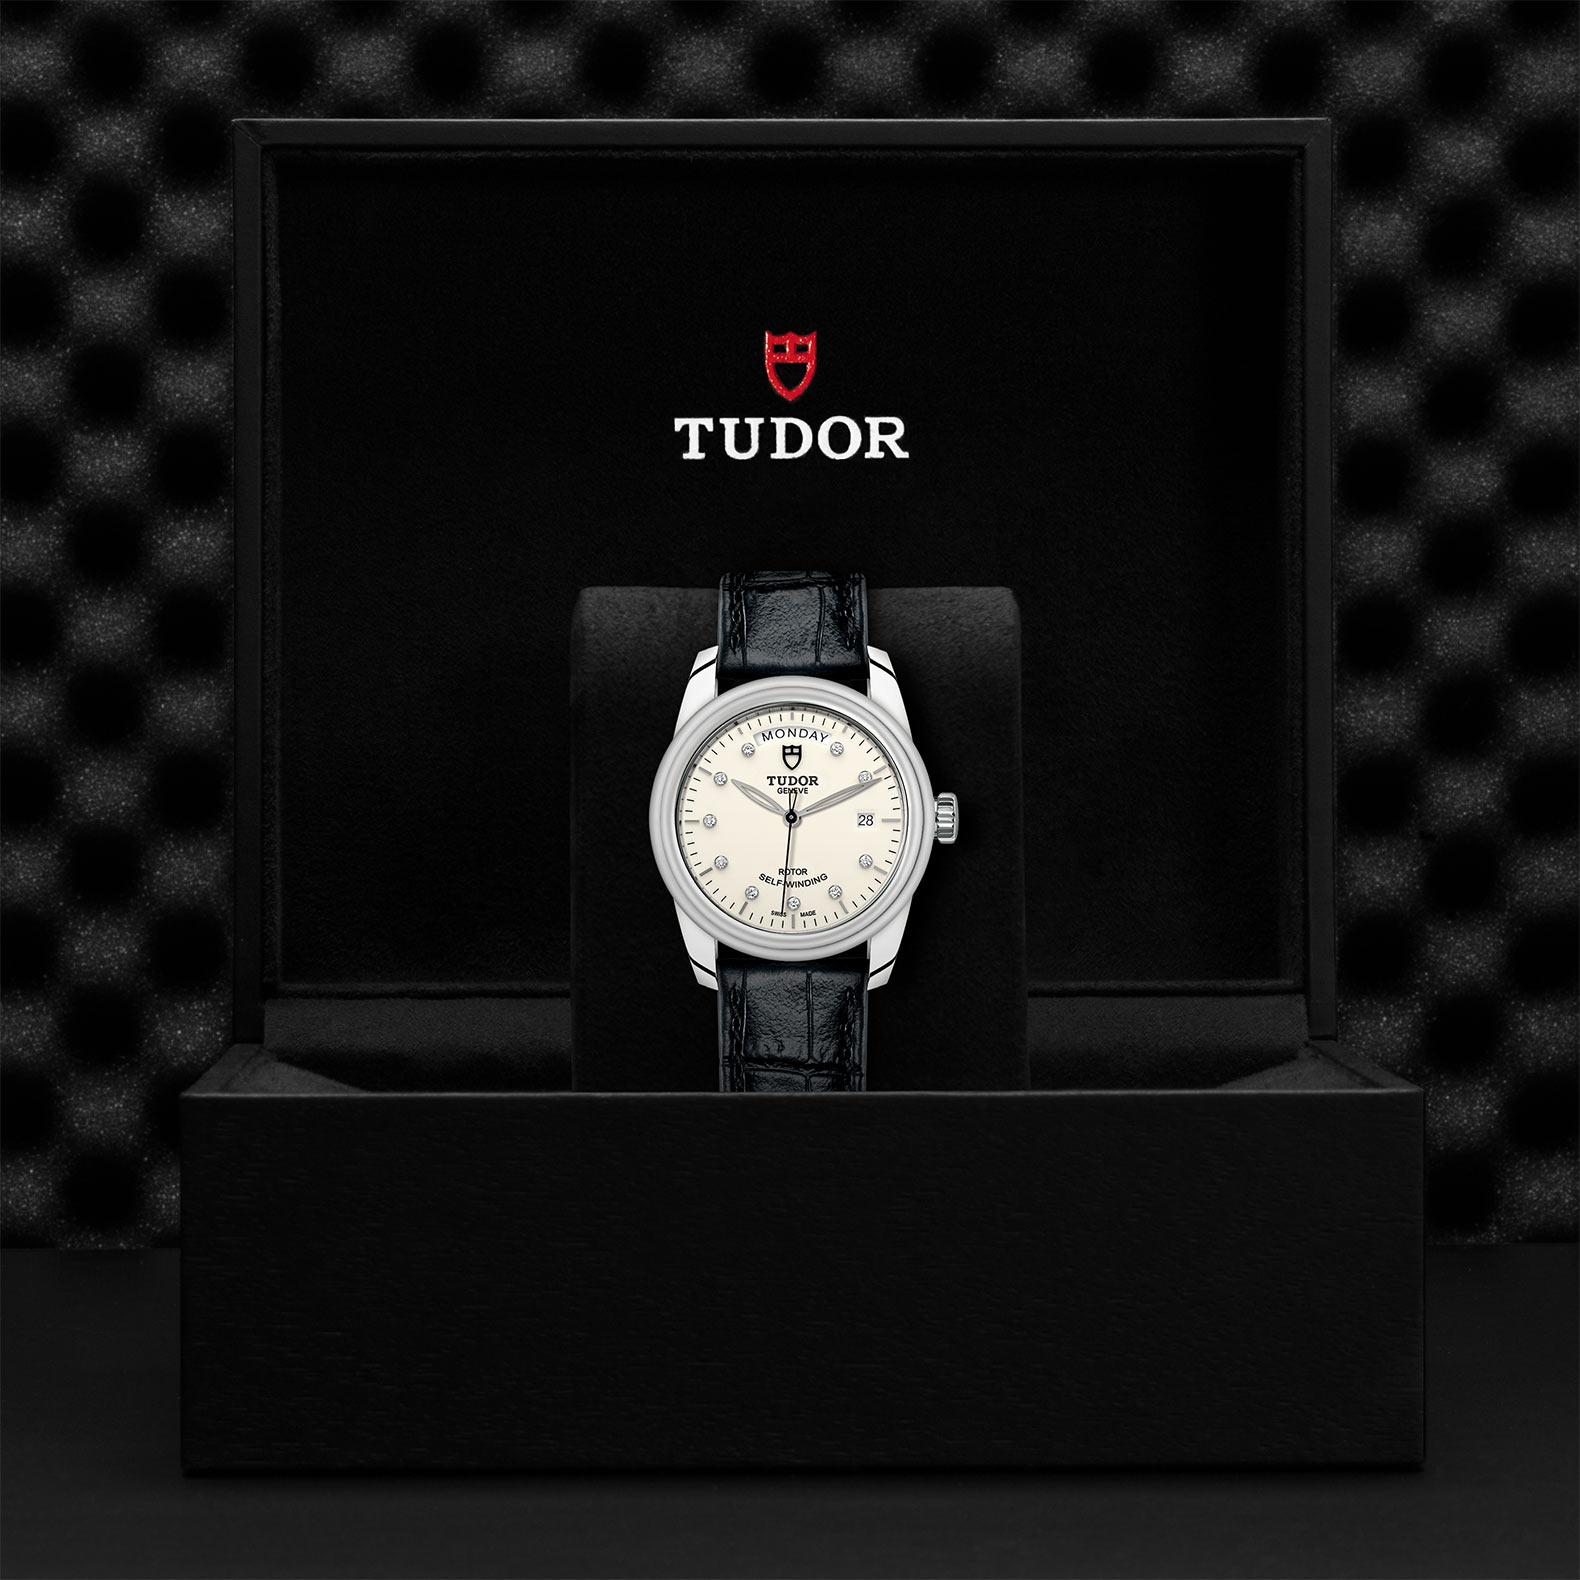 TUDOR Glamour Date Day M56000 0184 Presentationbox